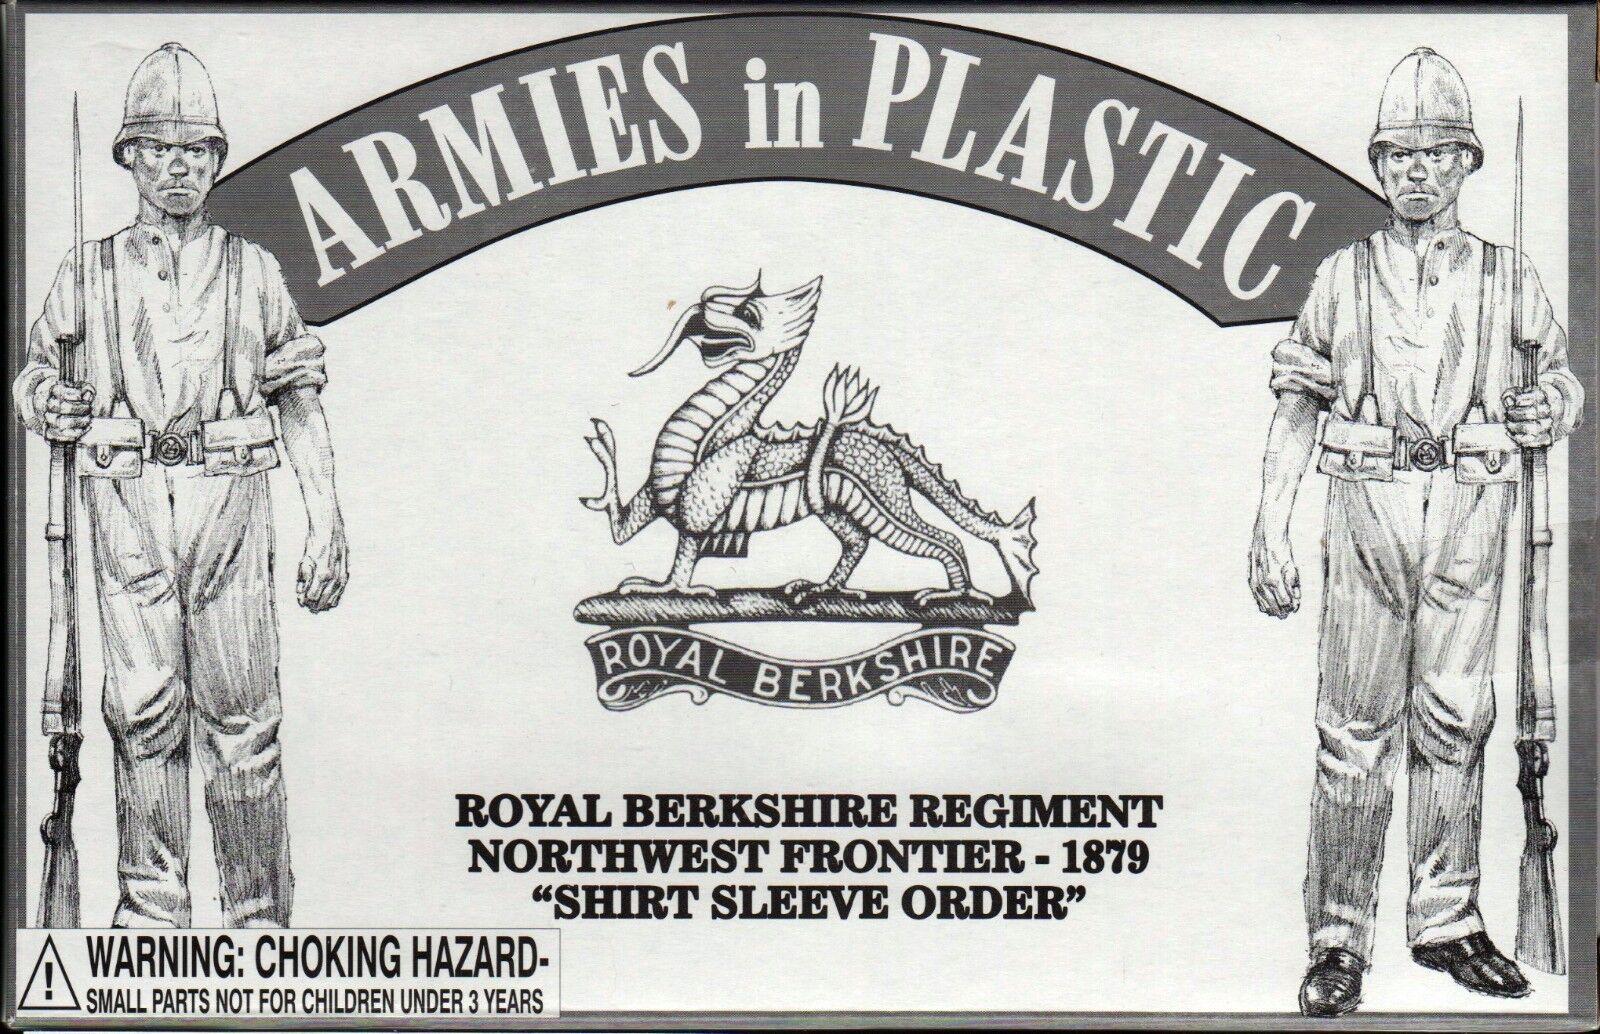 Armies in Plastic Northwest Frontier Berkshire Regt Shirt Sleeve 1/32 Scale 54mm